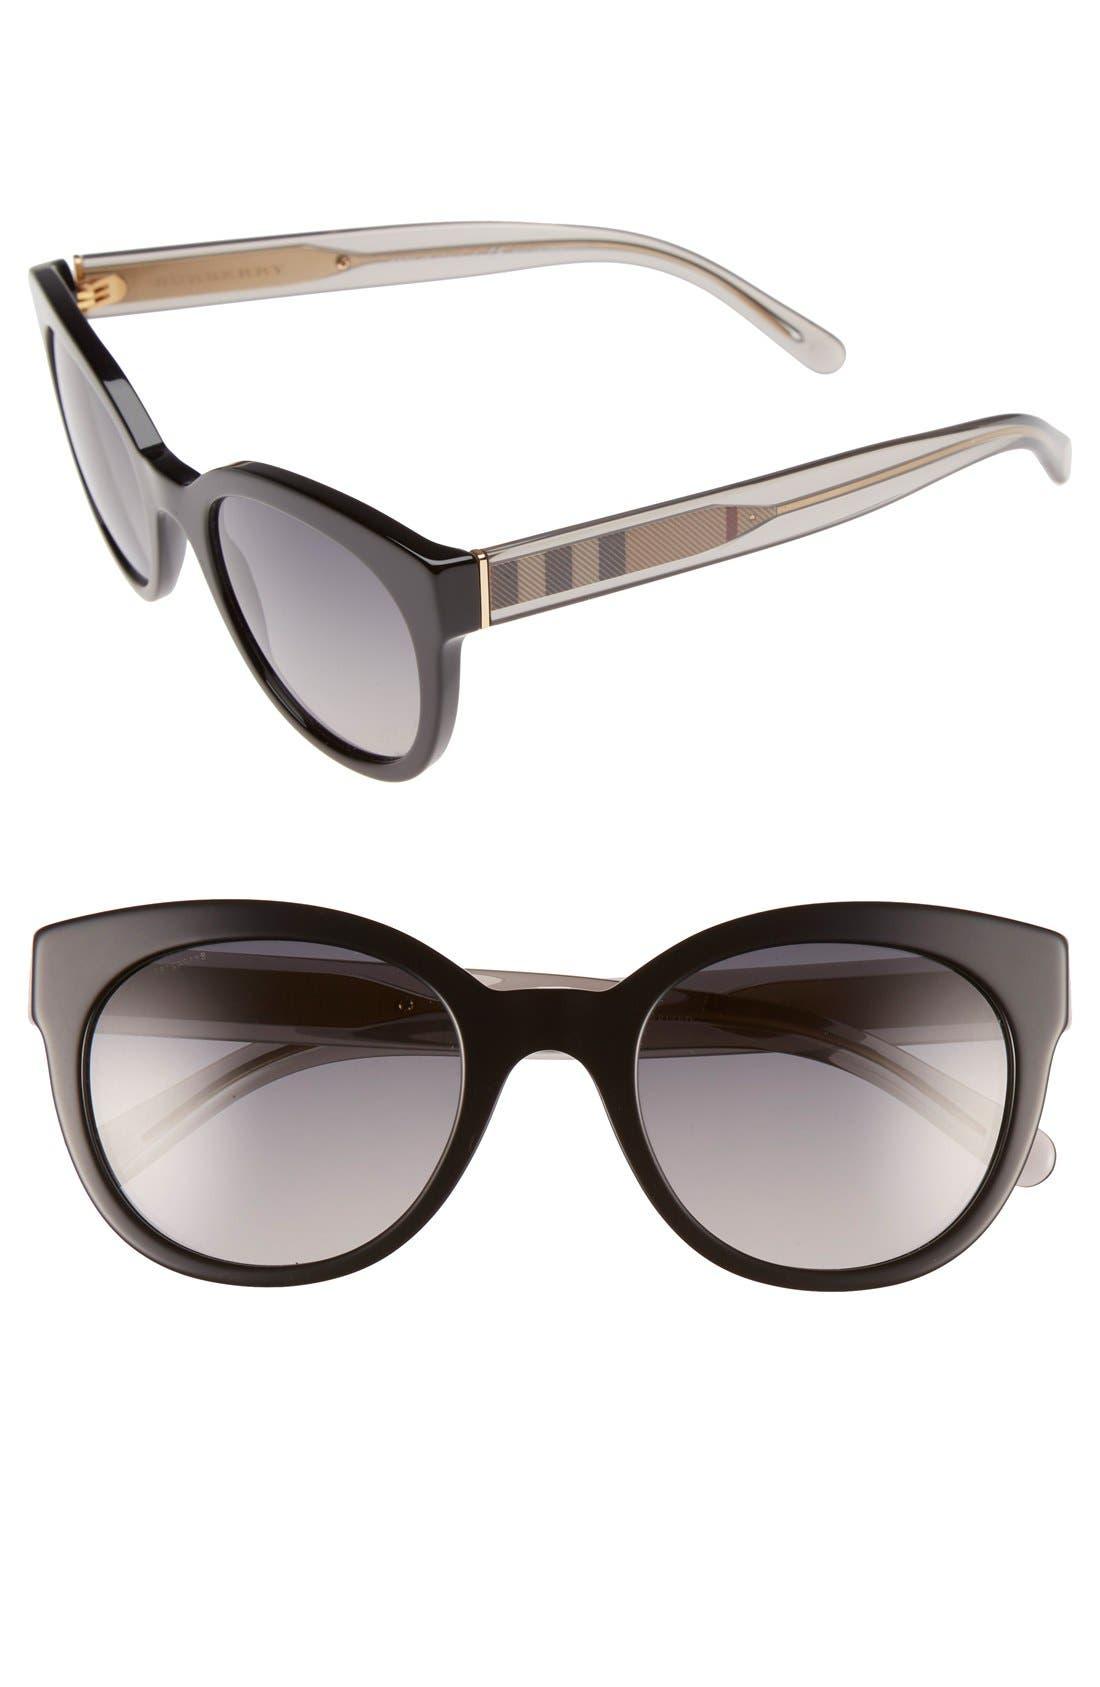 Main Image - Burberry 52mm Polarized Retro Sunglasses